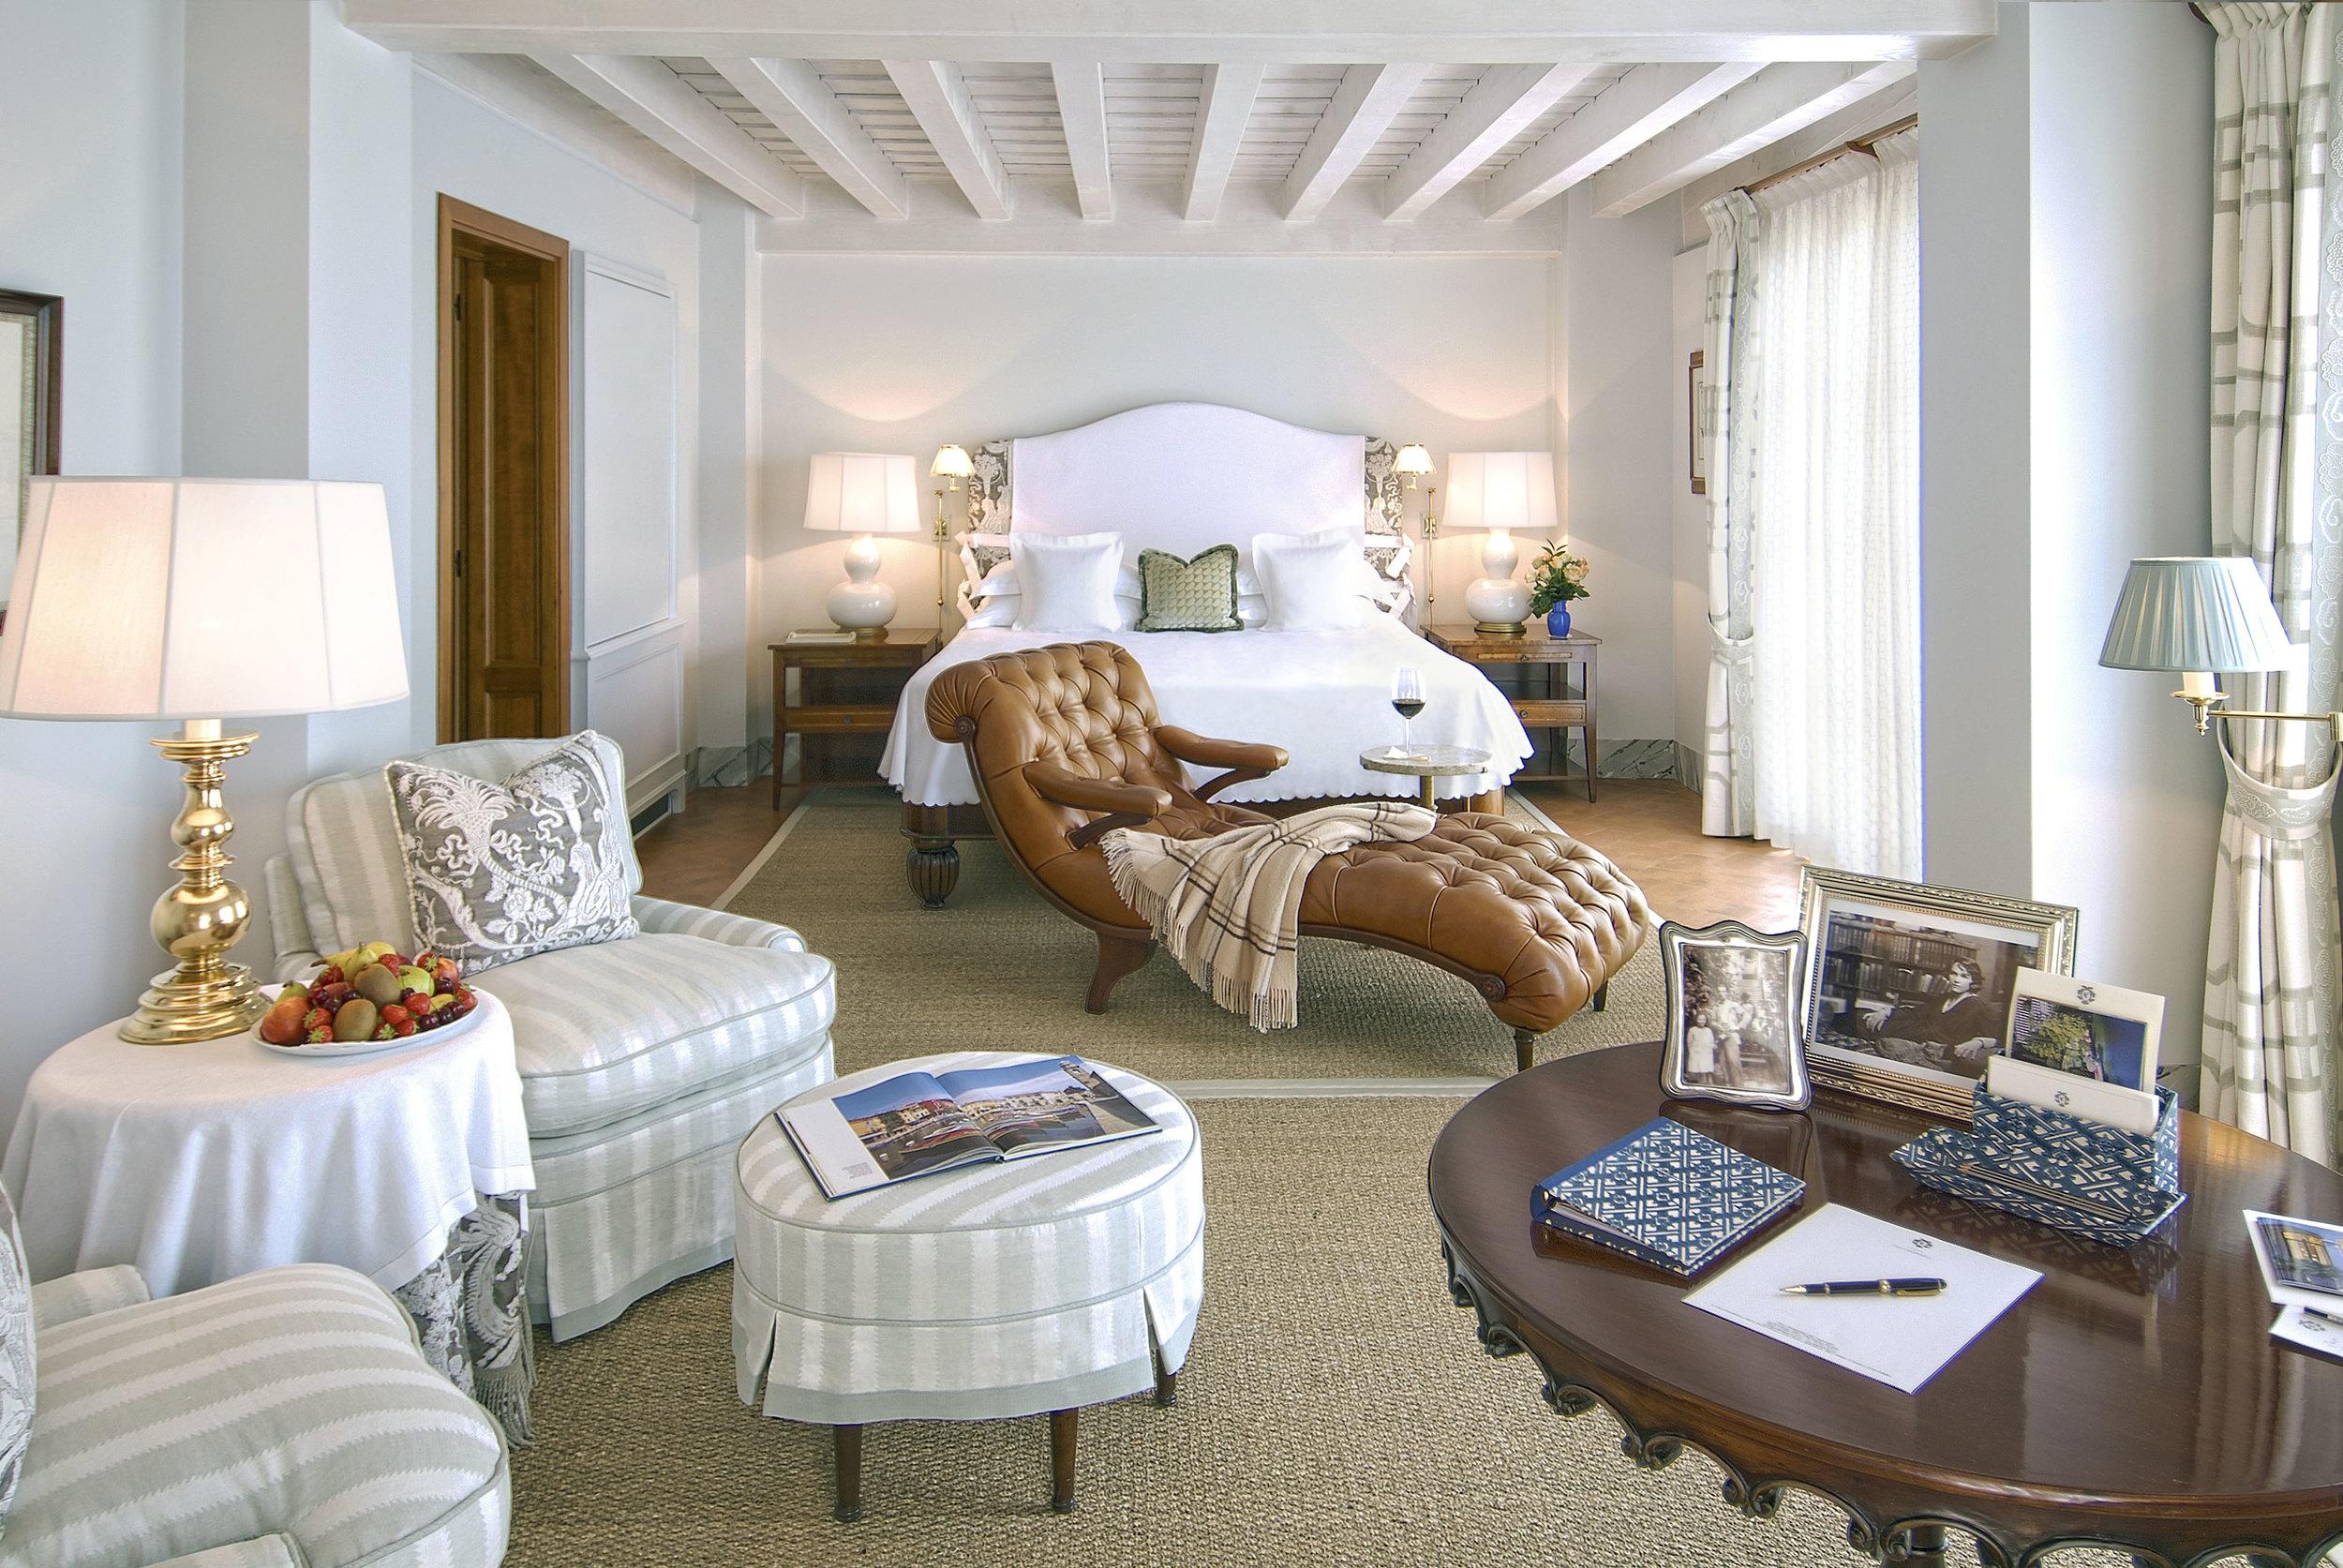 The Grand Hotel a Villa Feltrinelli, Italy